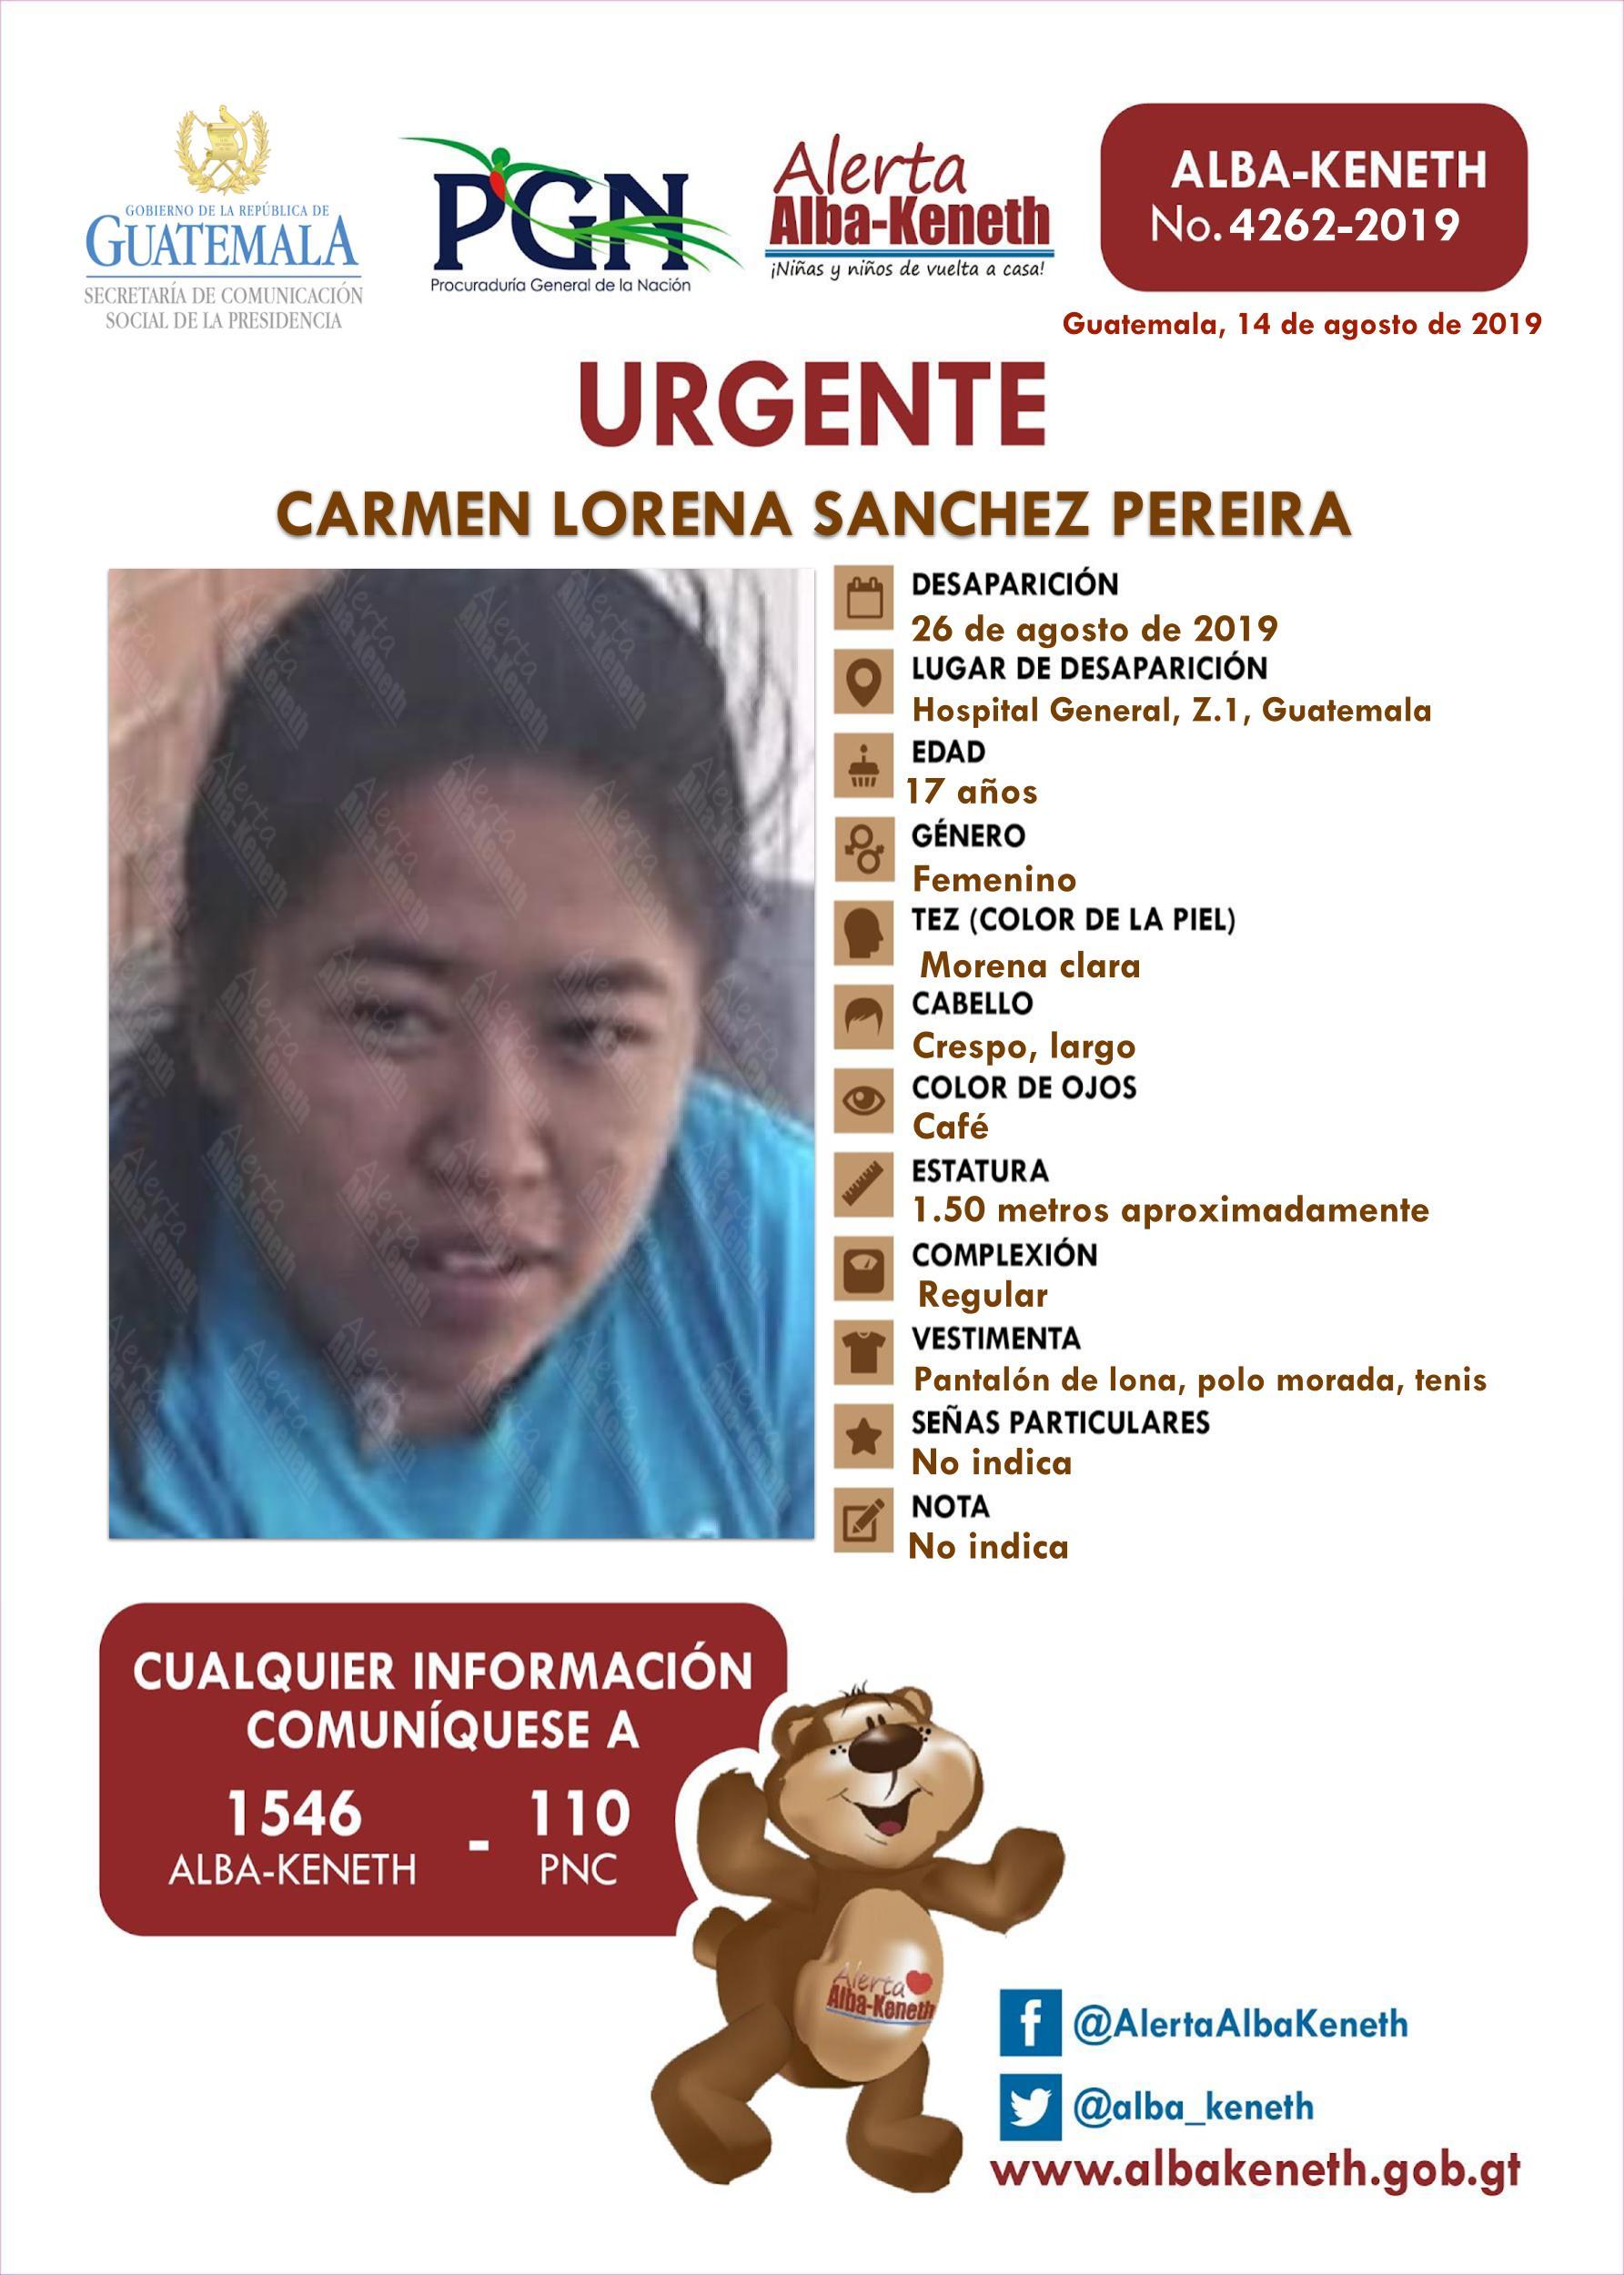 Carmen Lorena Sanchez Pereira